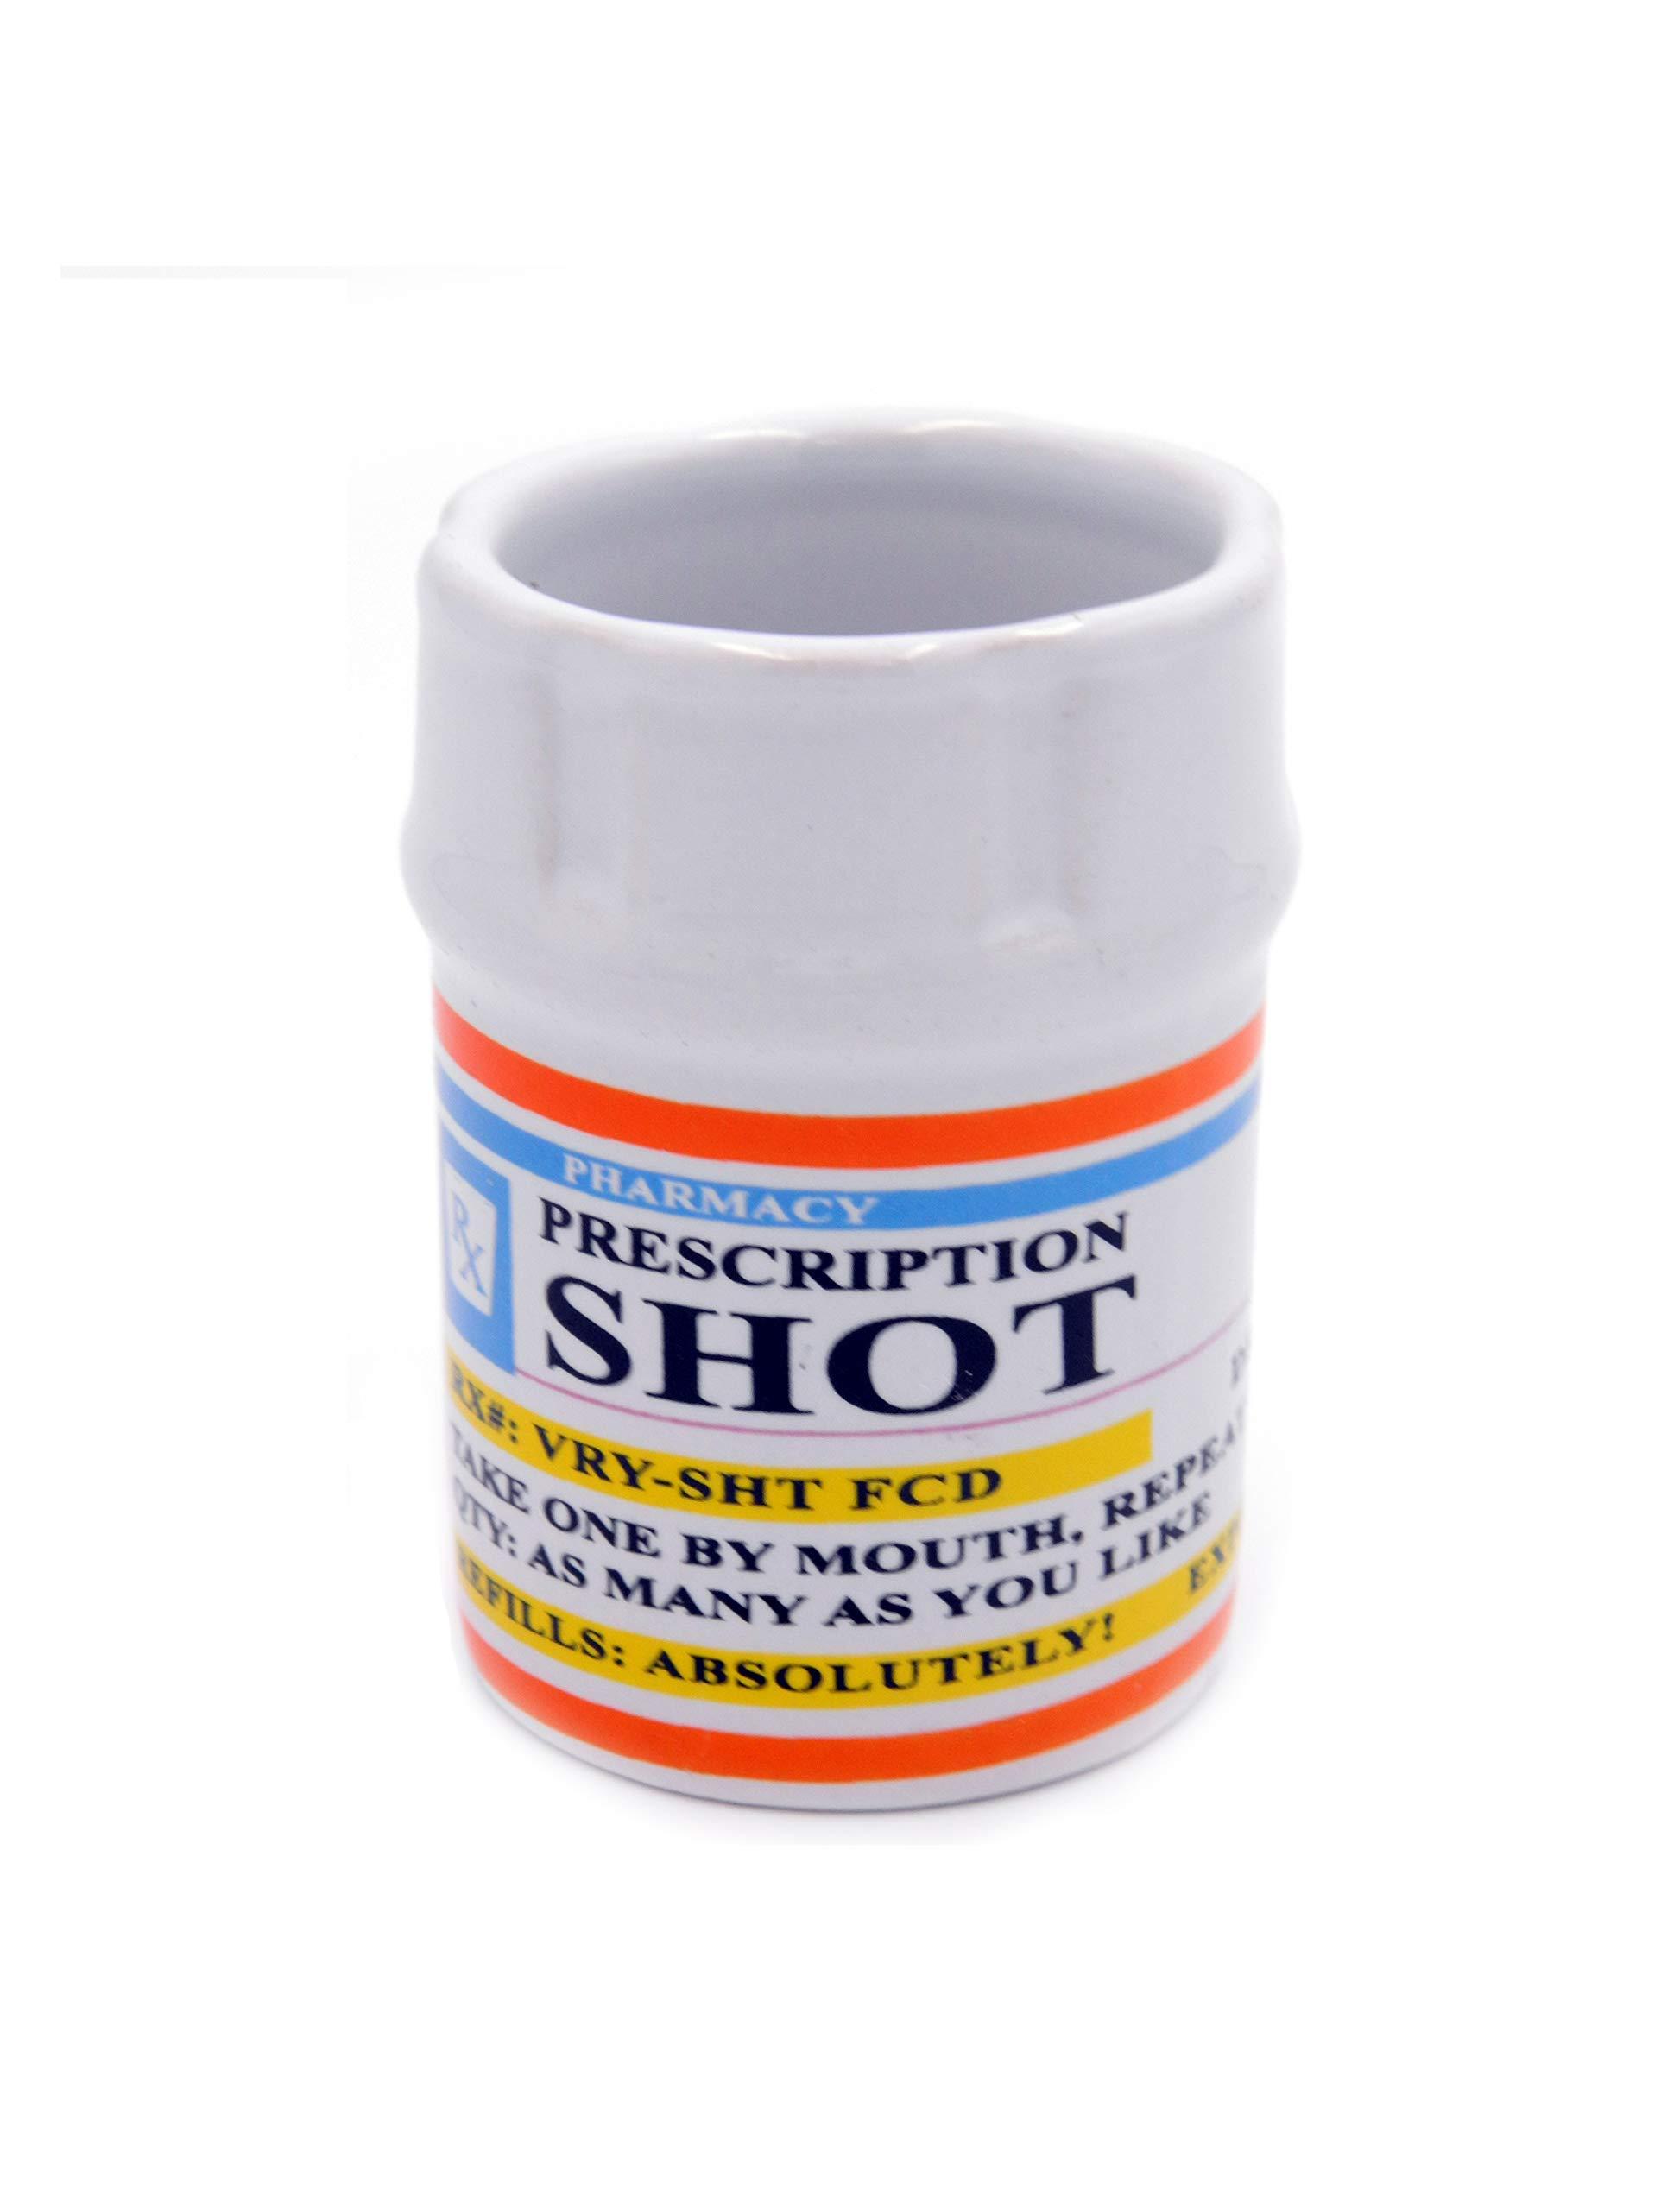 Shot Glasses – Prescription Pill Bottle Shot Glass – 2 oz. RX Prescription Unique Funny Novelty 1 Shot Glass set.